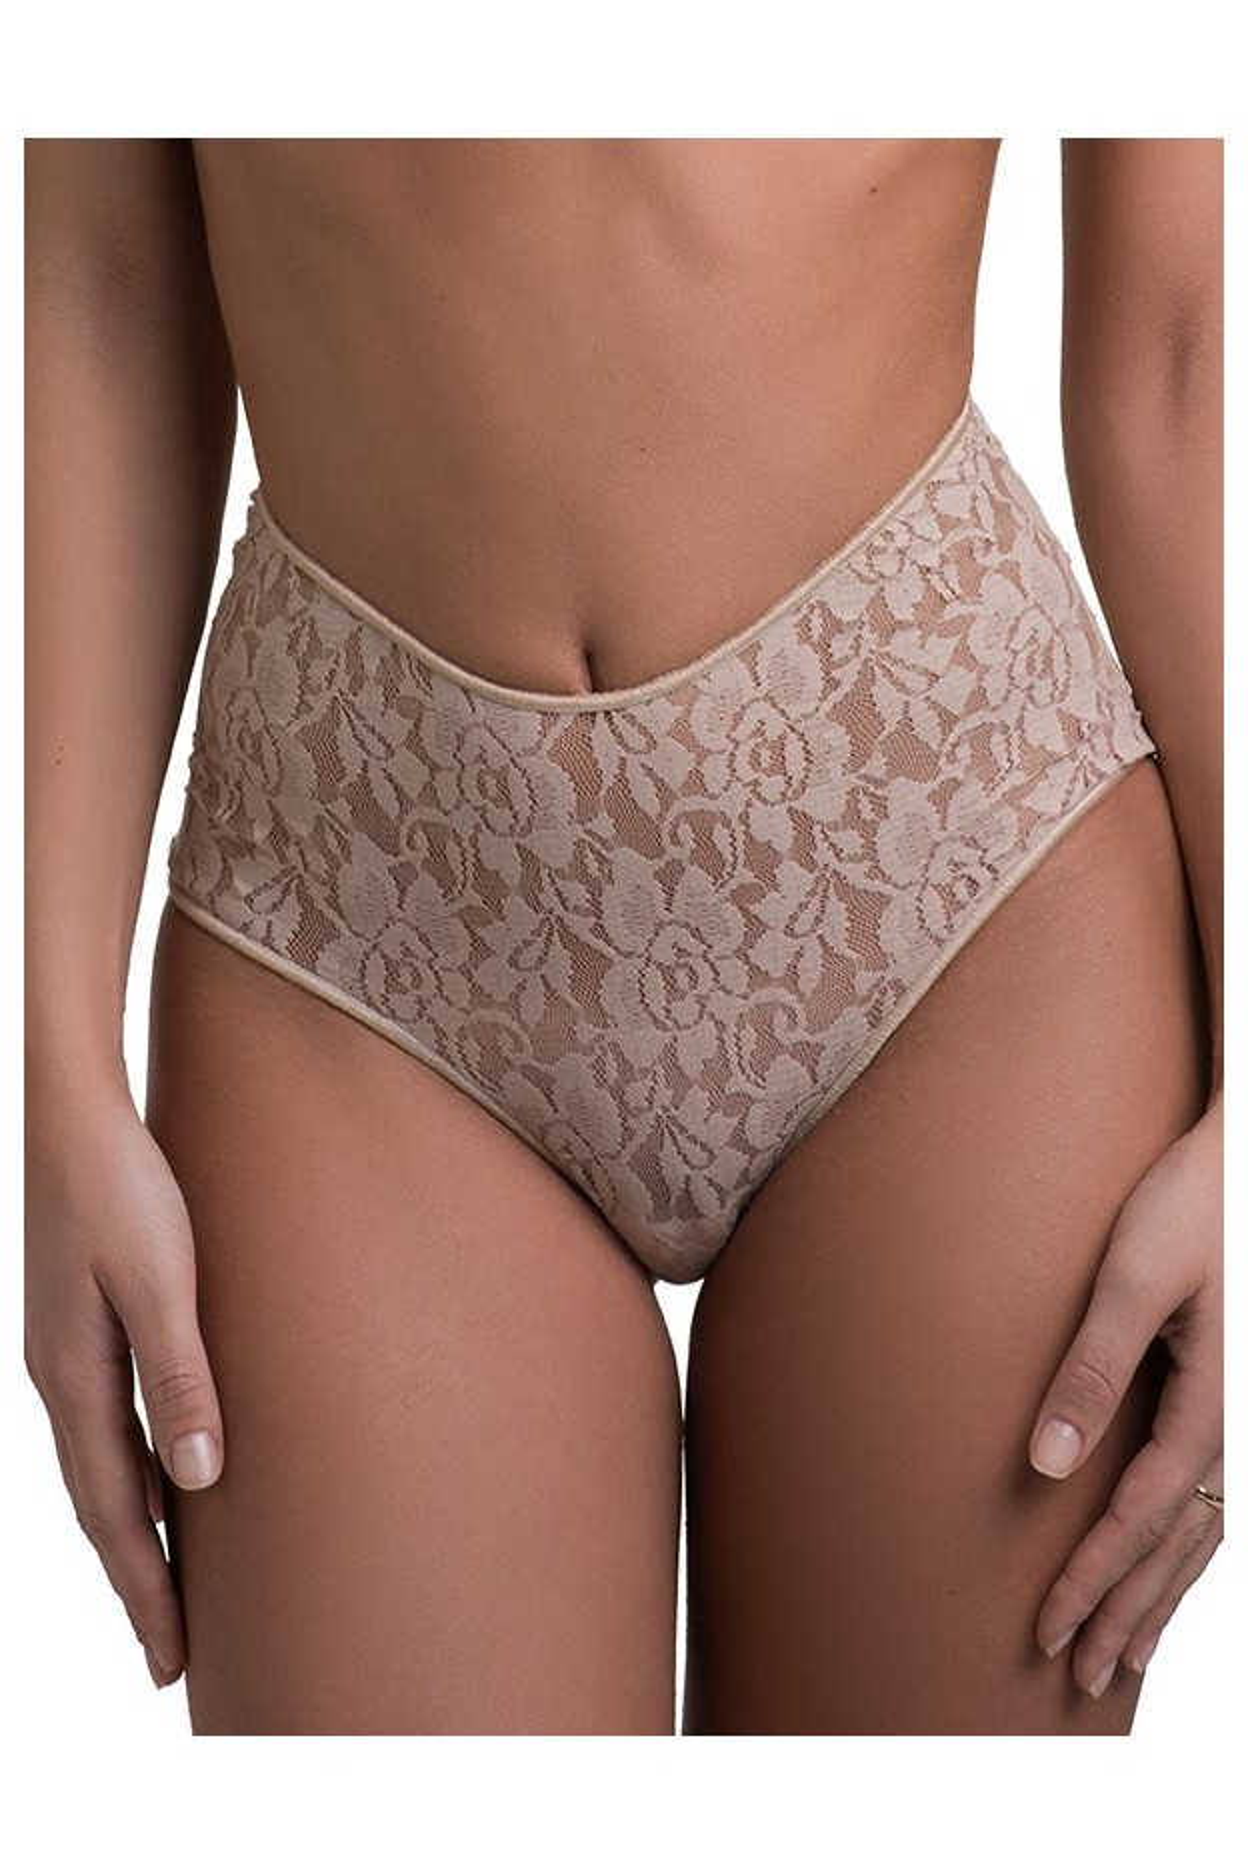 solange nude - slip intimo - donna - lingerie